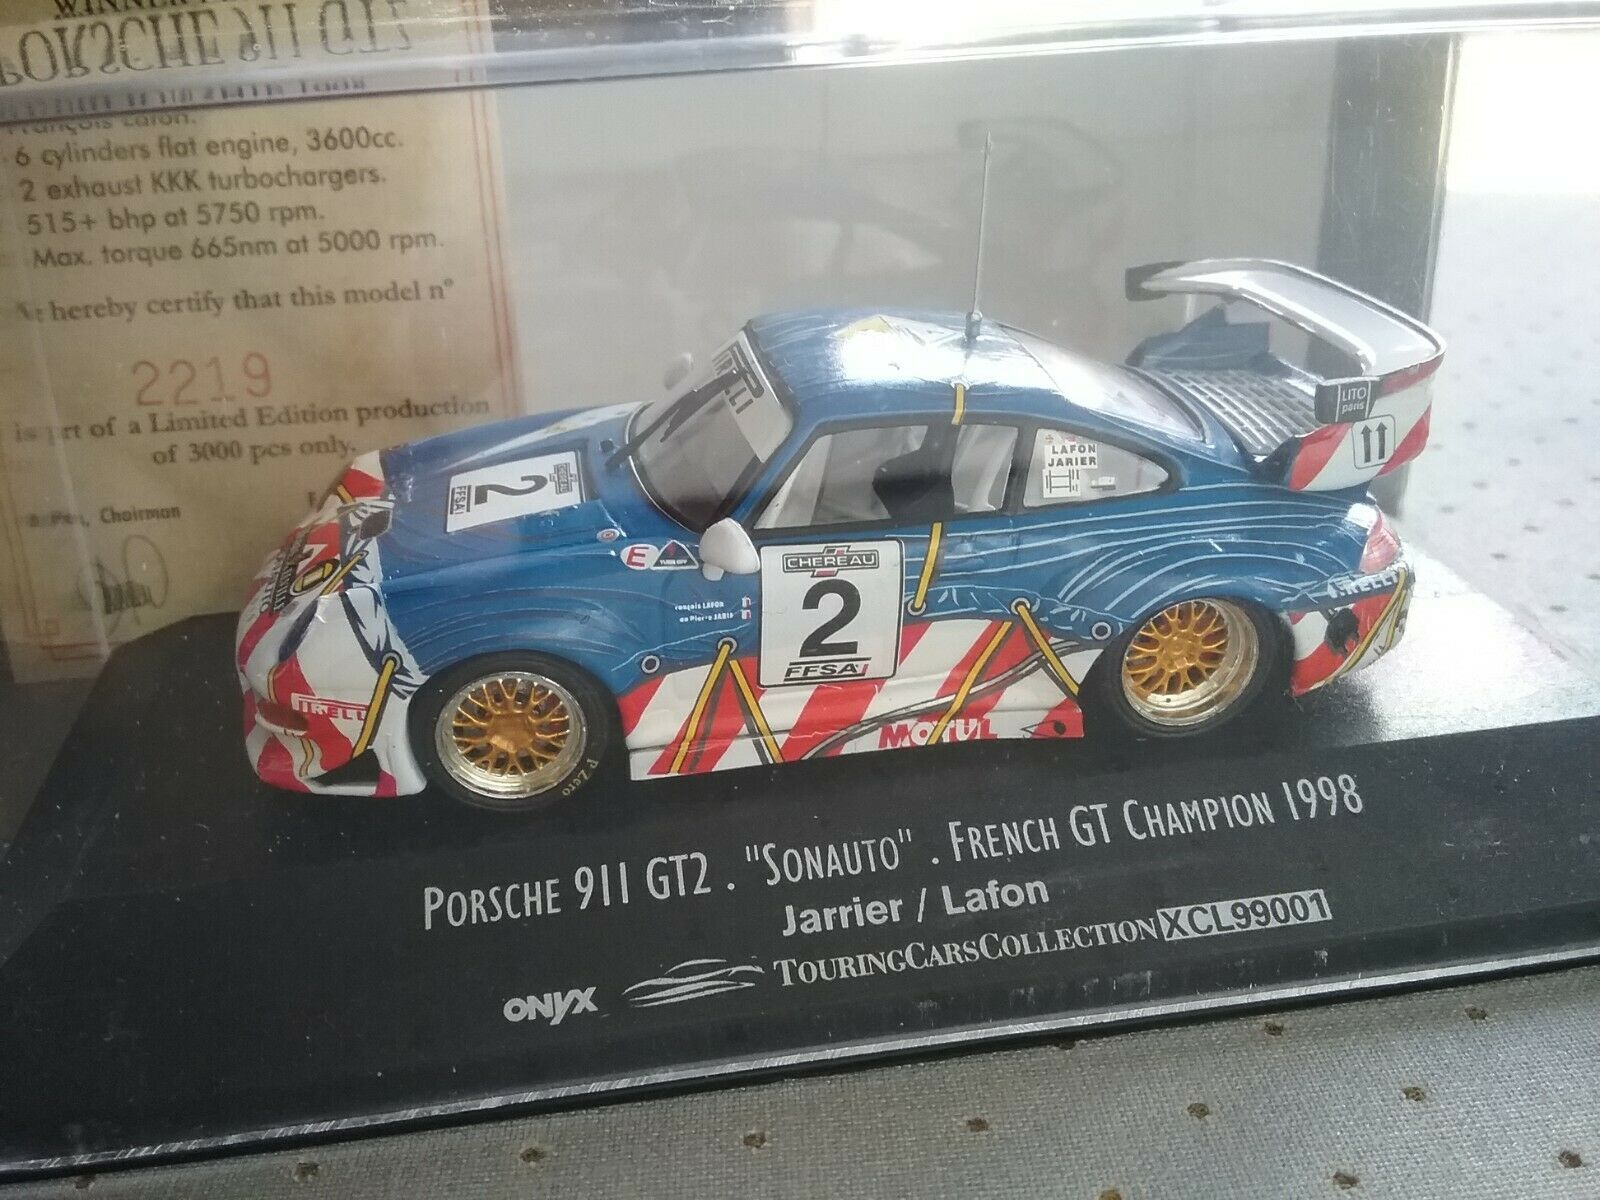 PORSCHE 911 GT2  SONAUTO  1 43  2 ONYX